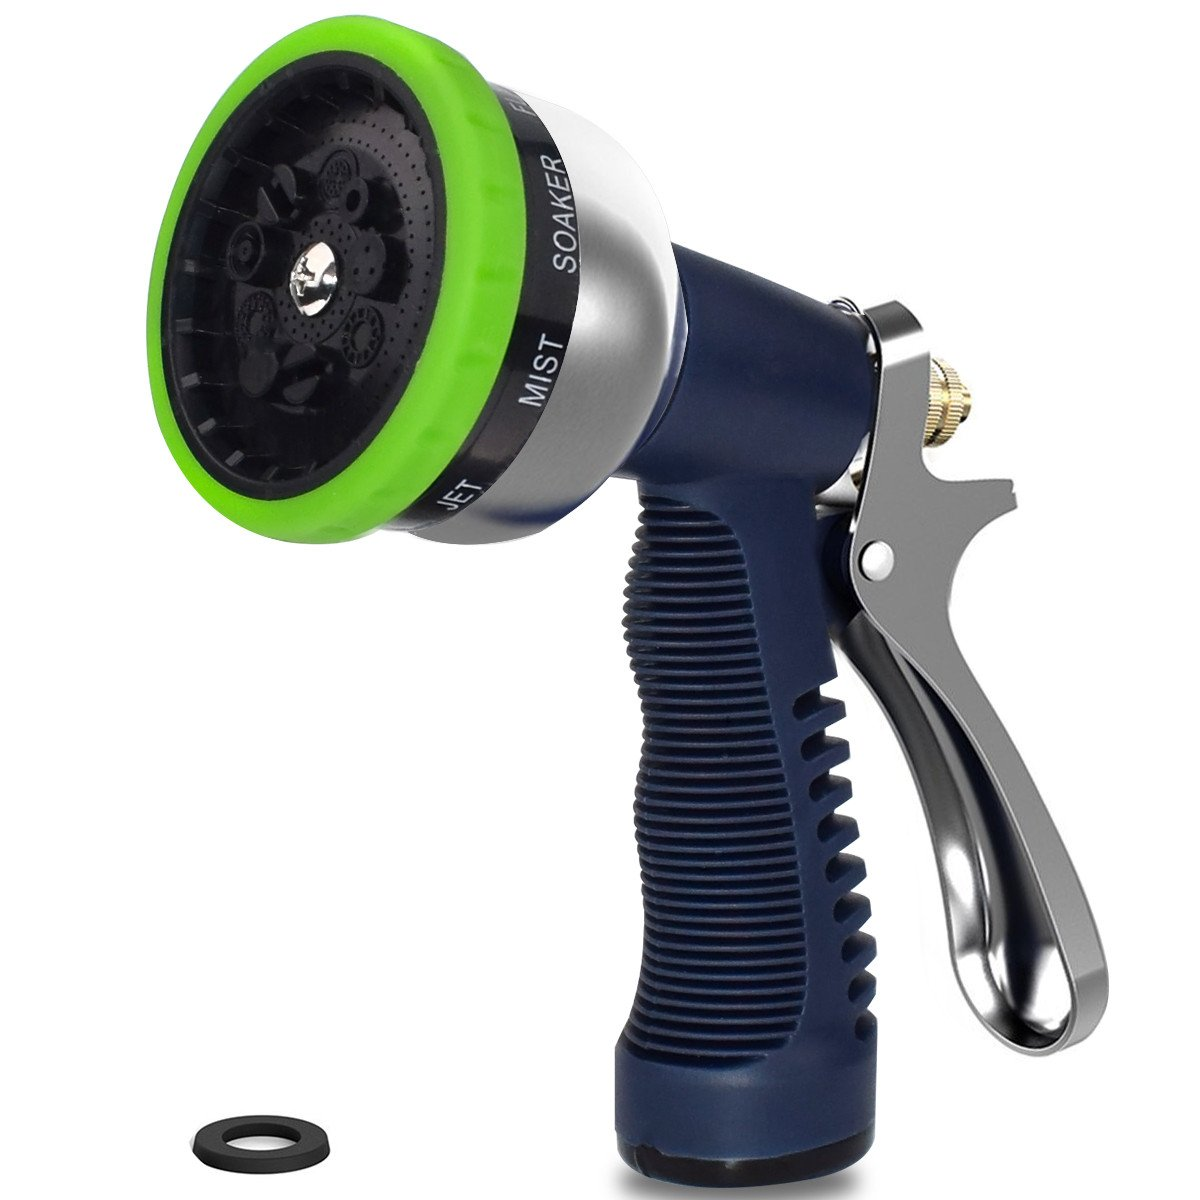 Garden Hose Nozzle Sprayer, Adjustable 9 Watering Patterns Heavy Duty Metal Spray Nozzle for Hand Watering Plants & Lawn, Car Washing, Patio and Pets